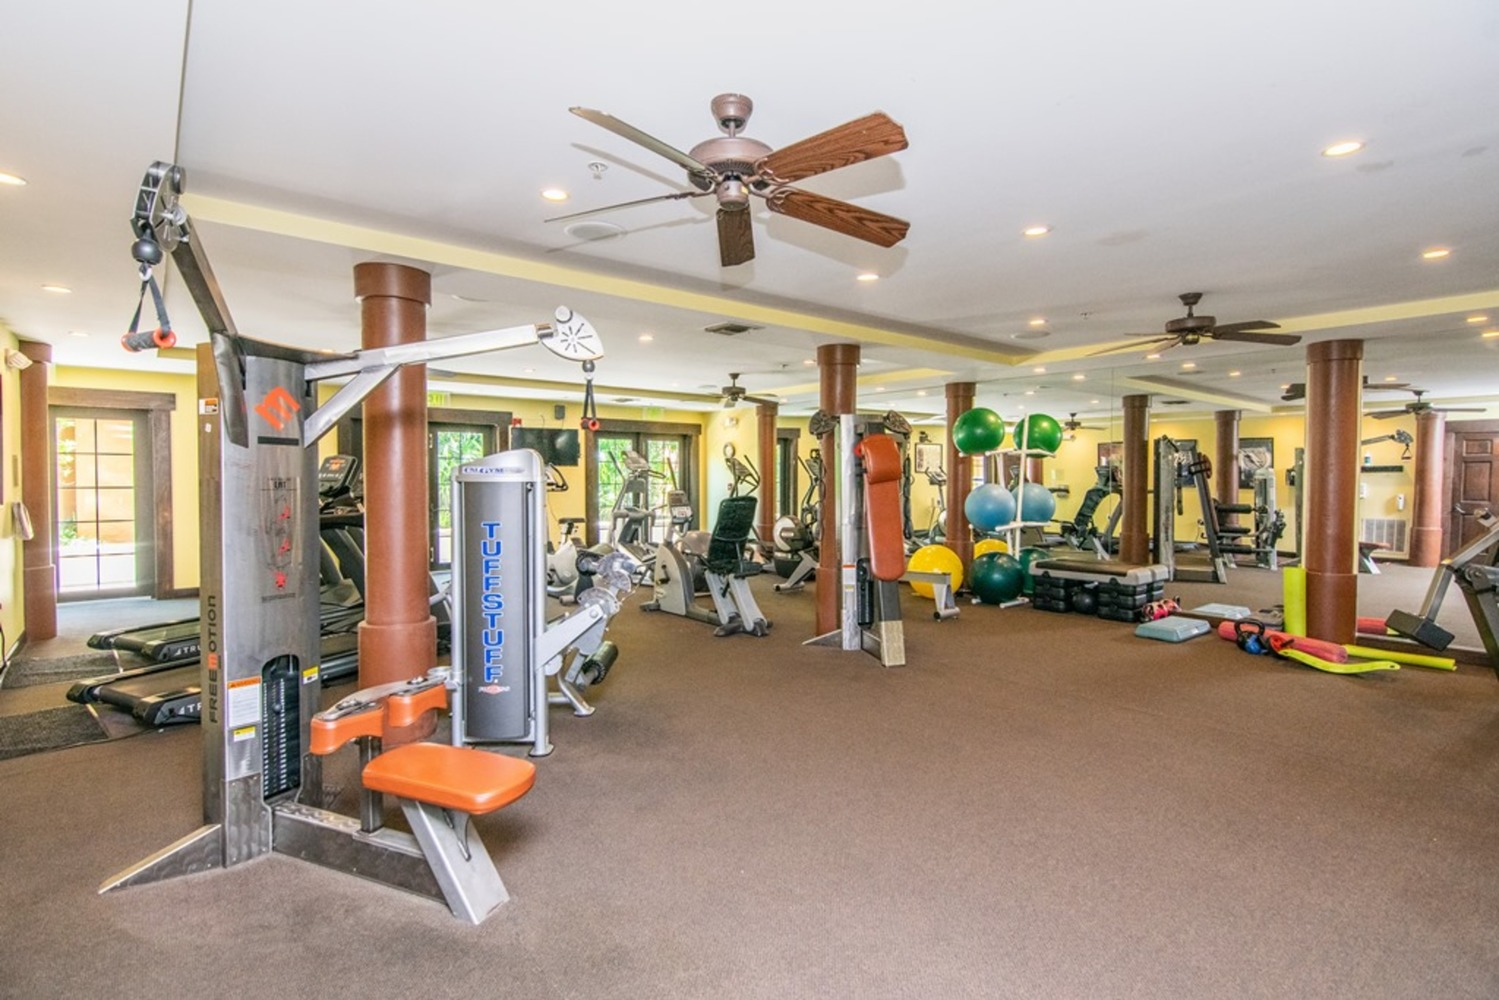 42 gym